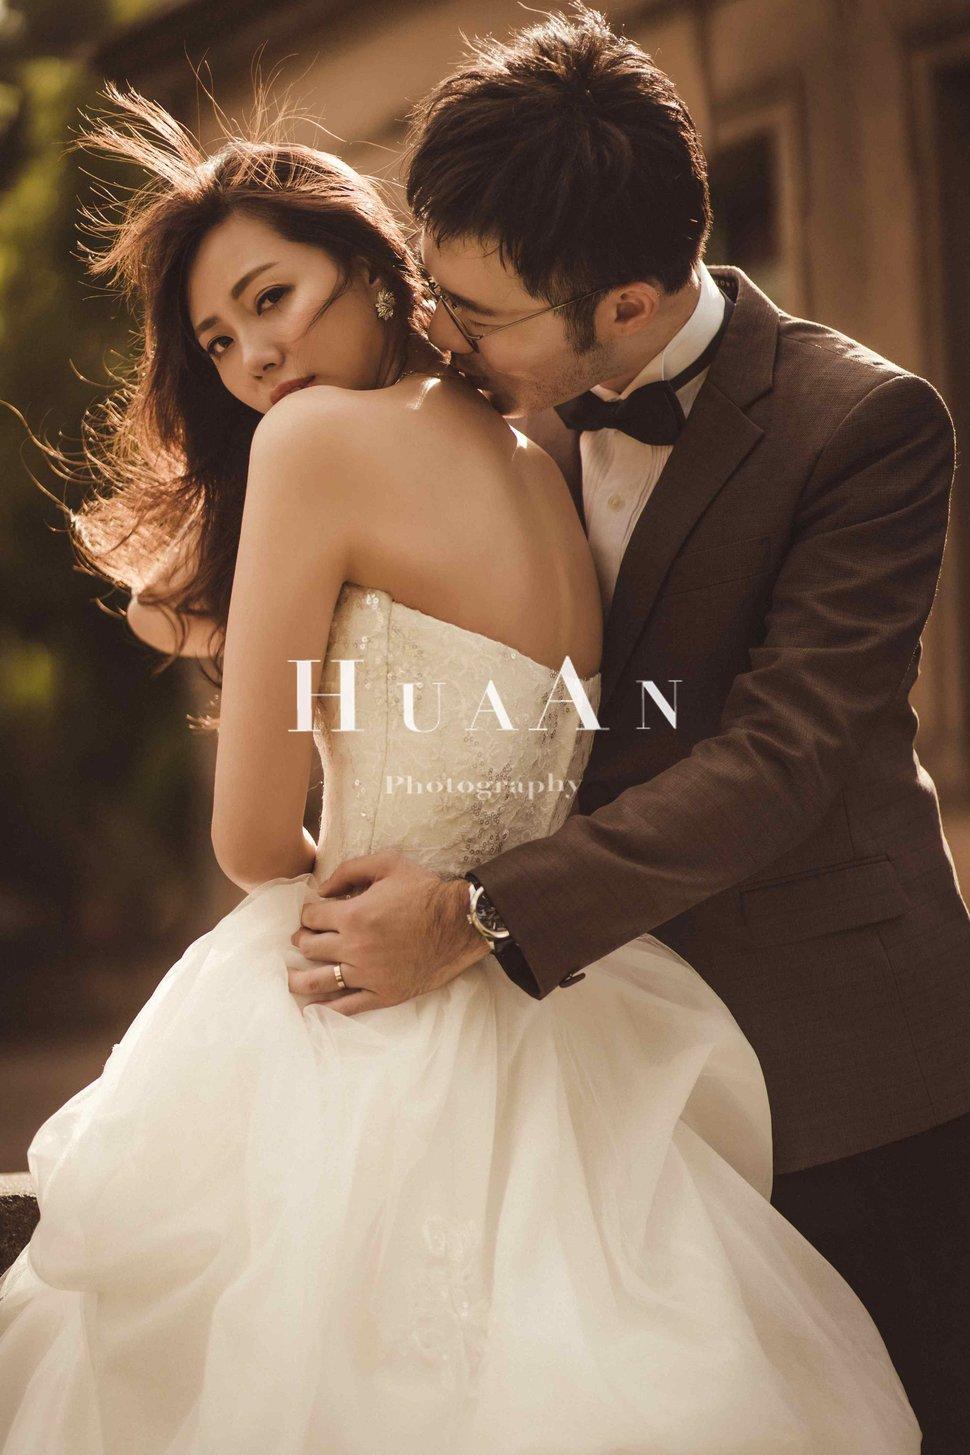 DSC02000 - Huaan Photography《結婚吧》